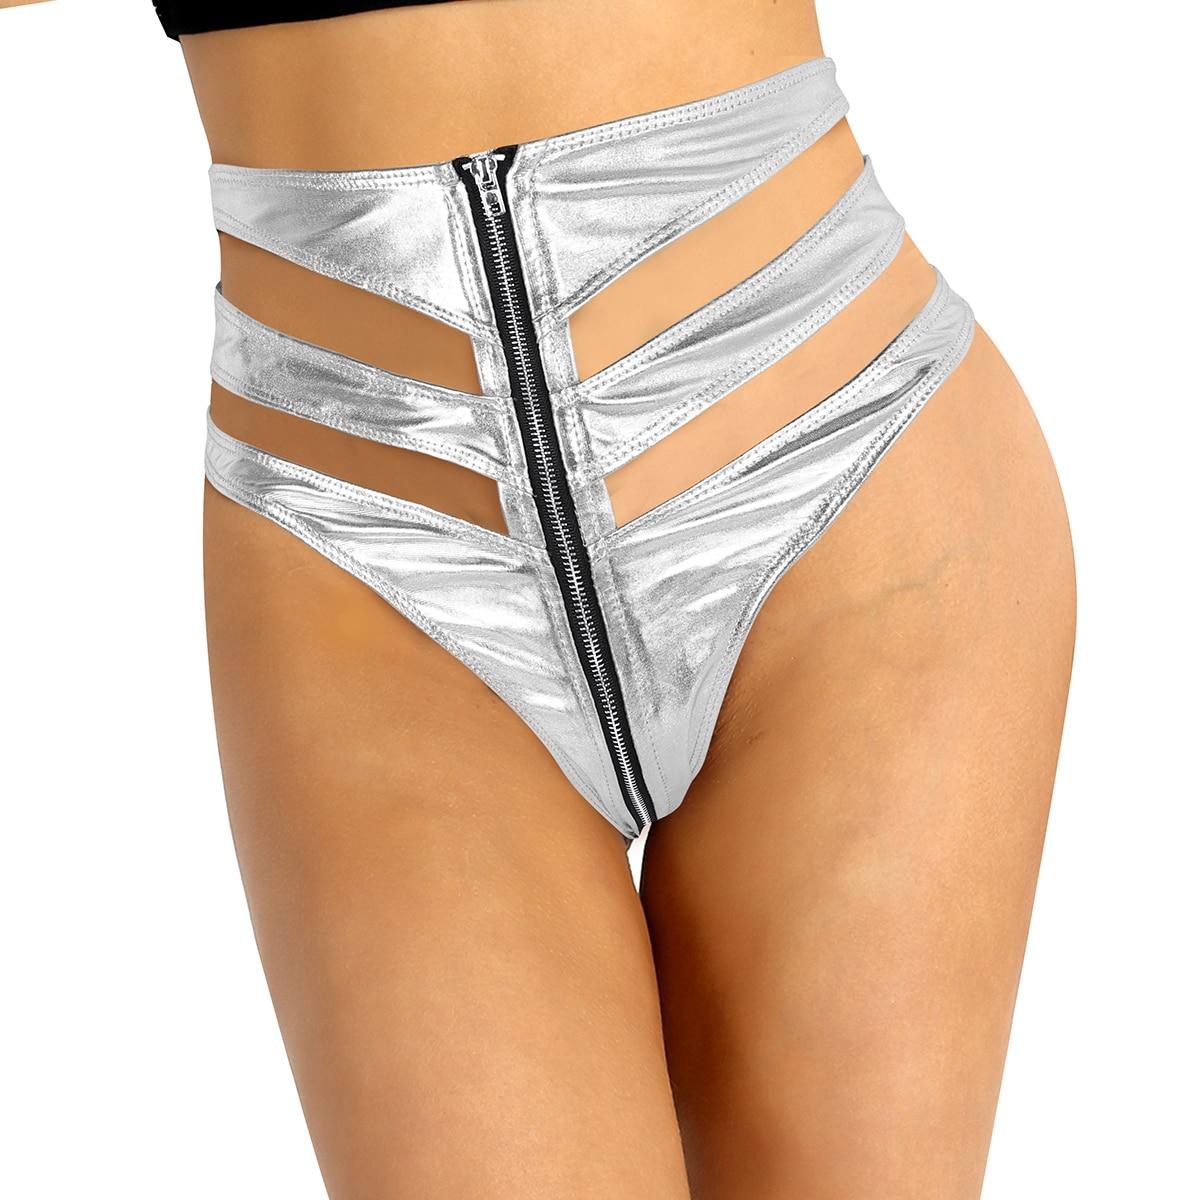 TiaoBug Shiny Metallic High Waist Front Zipper Women Hot Sexy Mini Booty Shorts Nightclub Party Rave Stage Pole Dance Costume